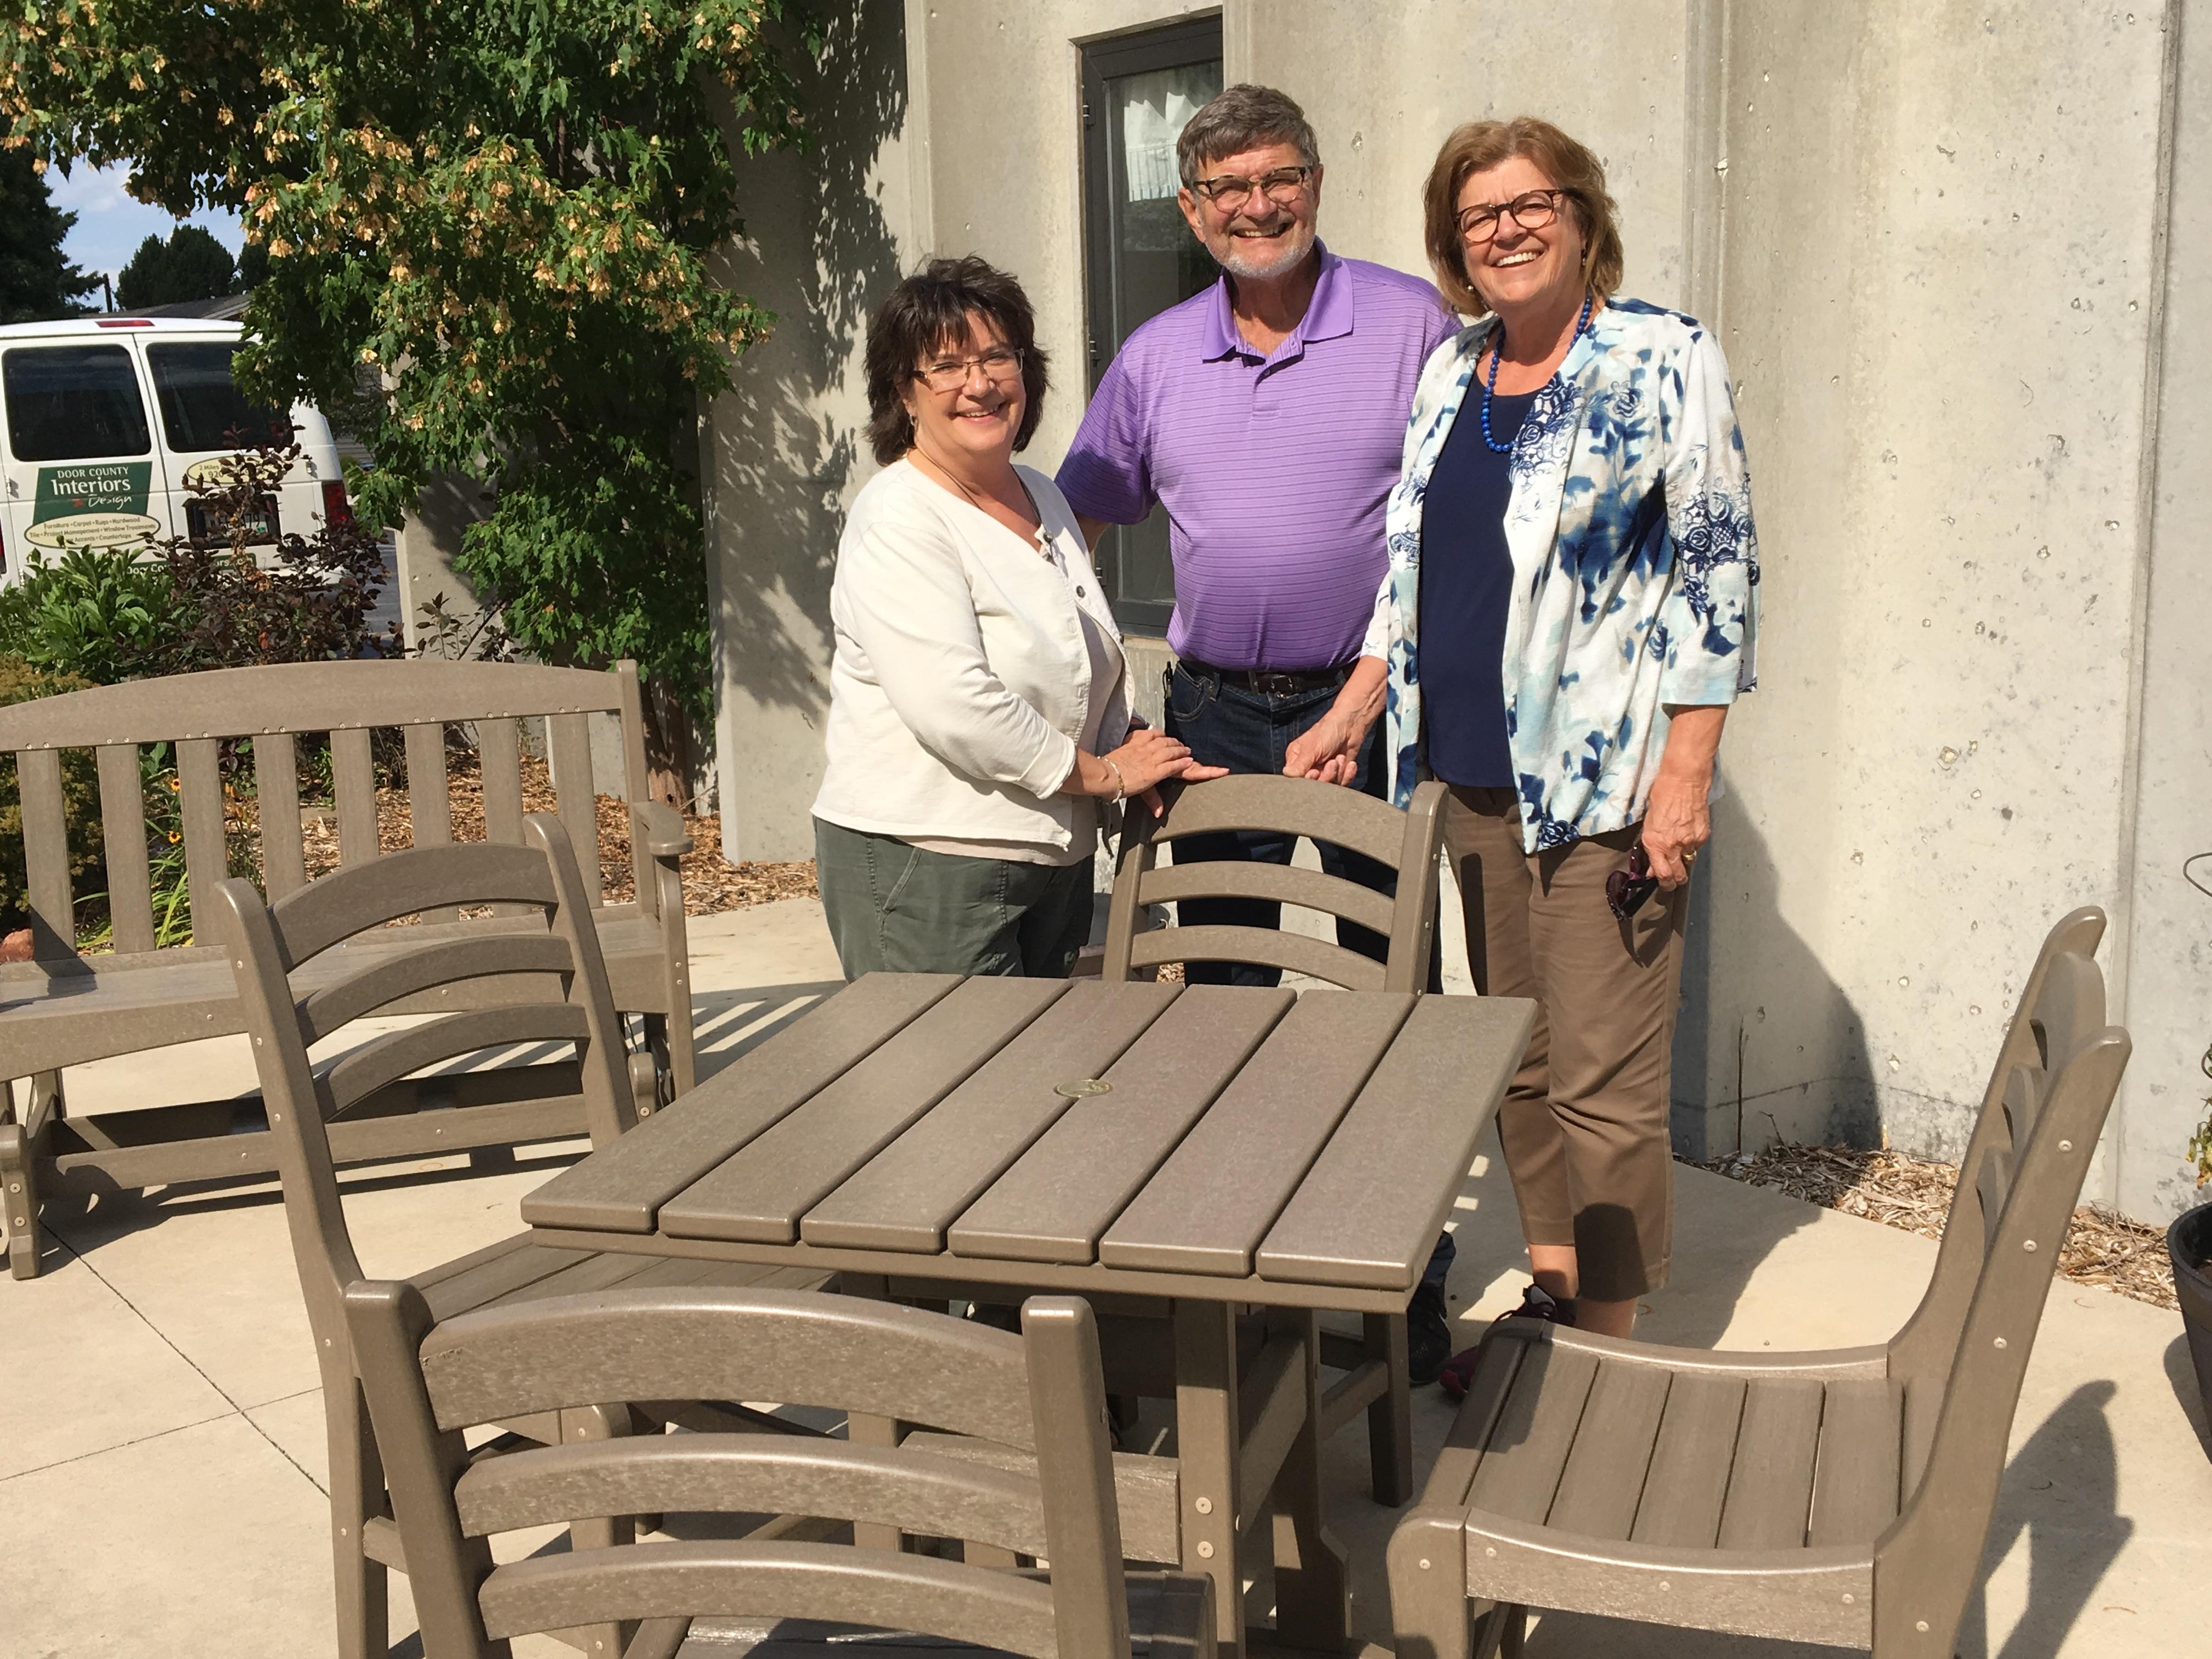 Door County Interiors Donate To Sunshine House